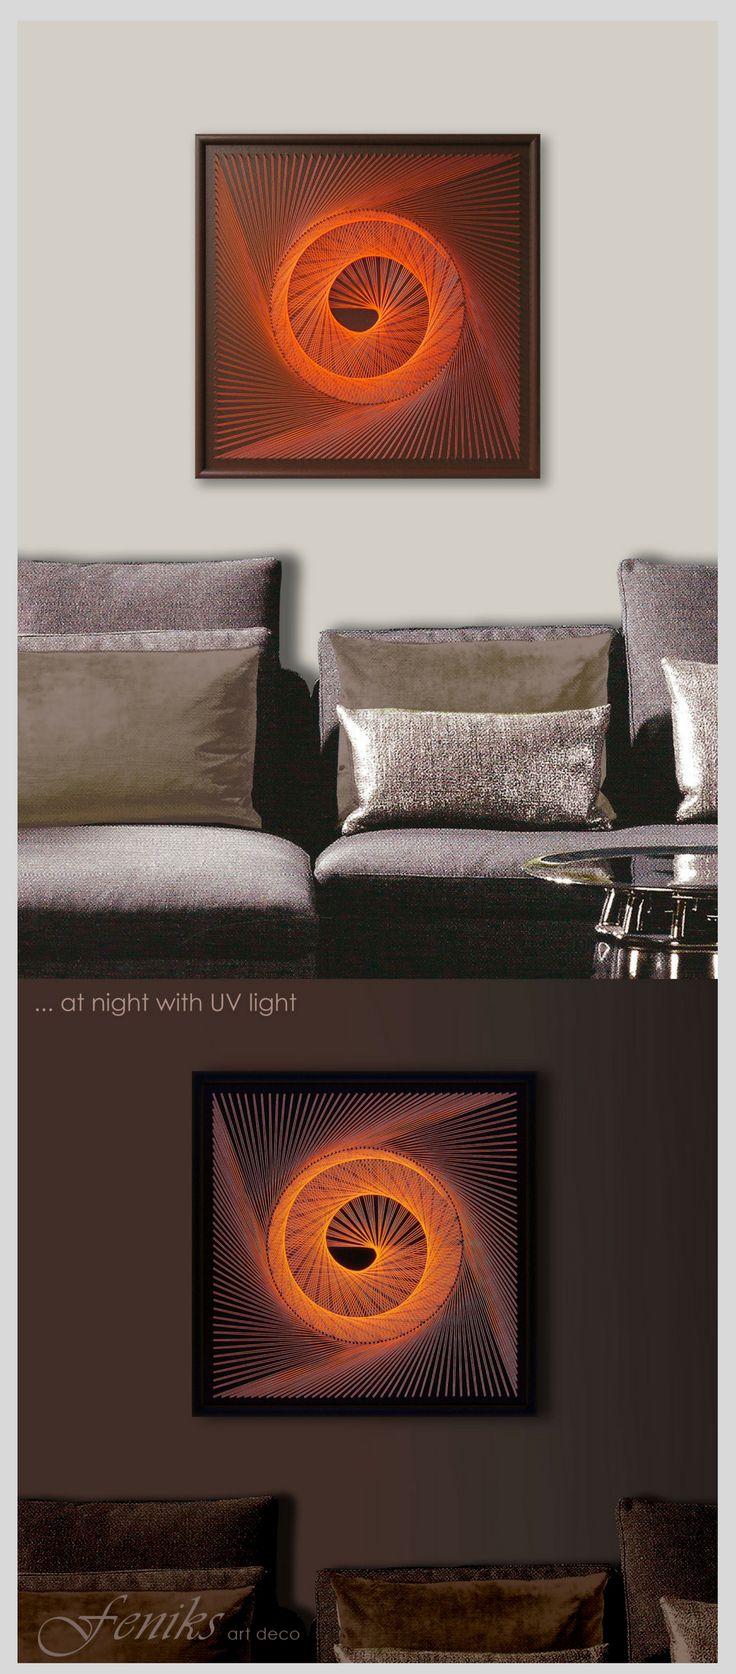 Zen Wall Decor 424 best my shop - home decor - feniksartdeco images on pinterest